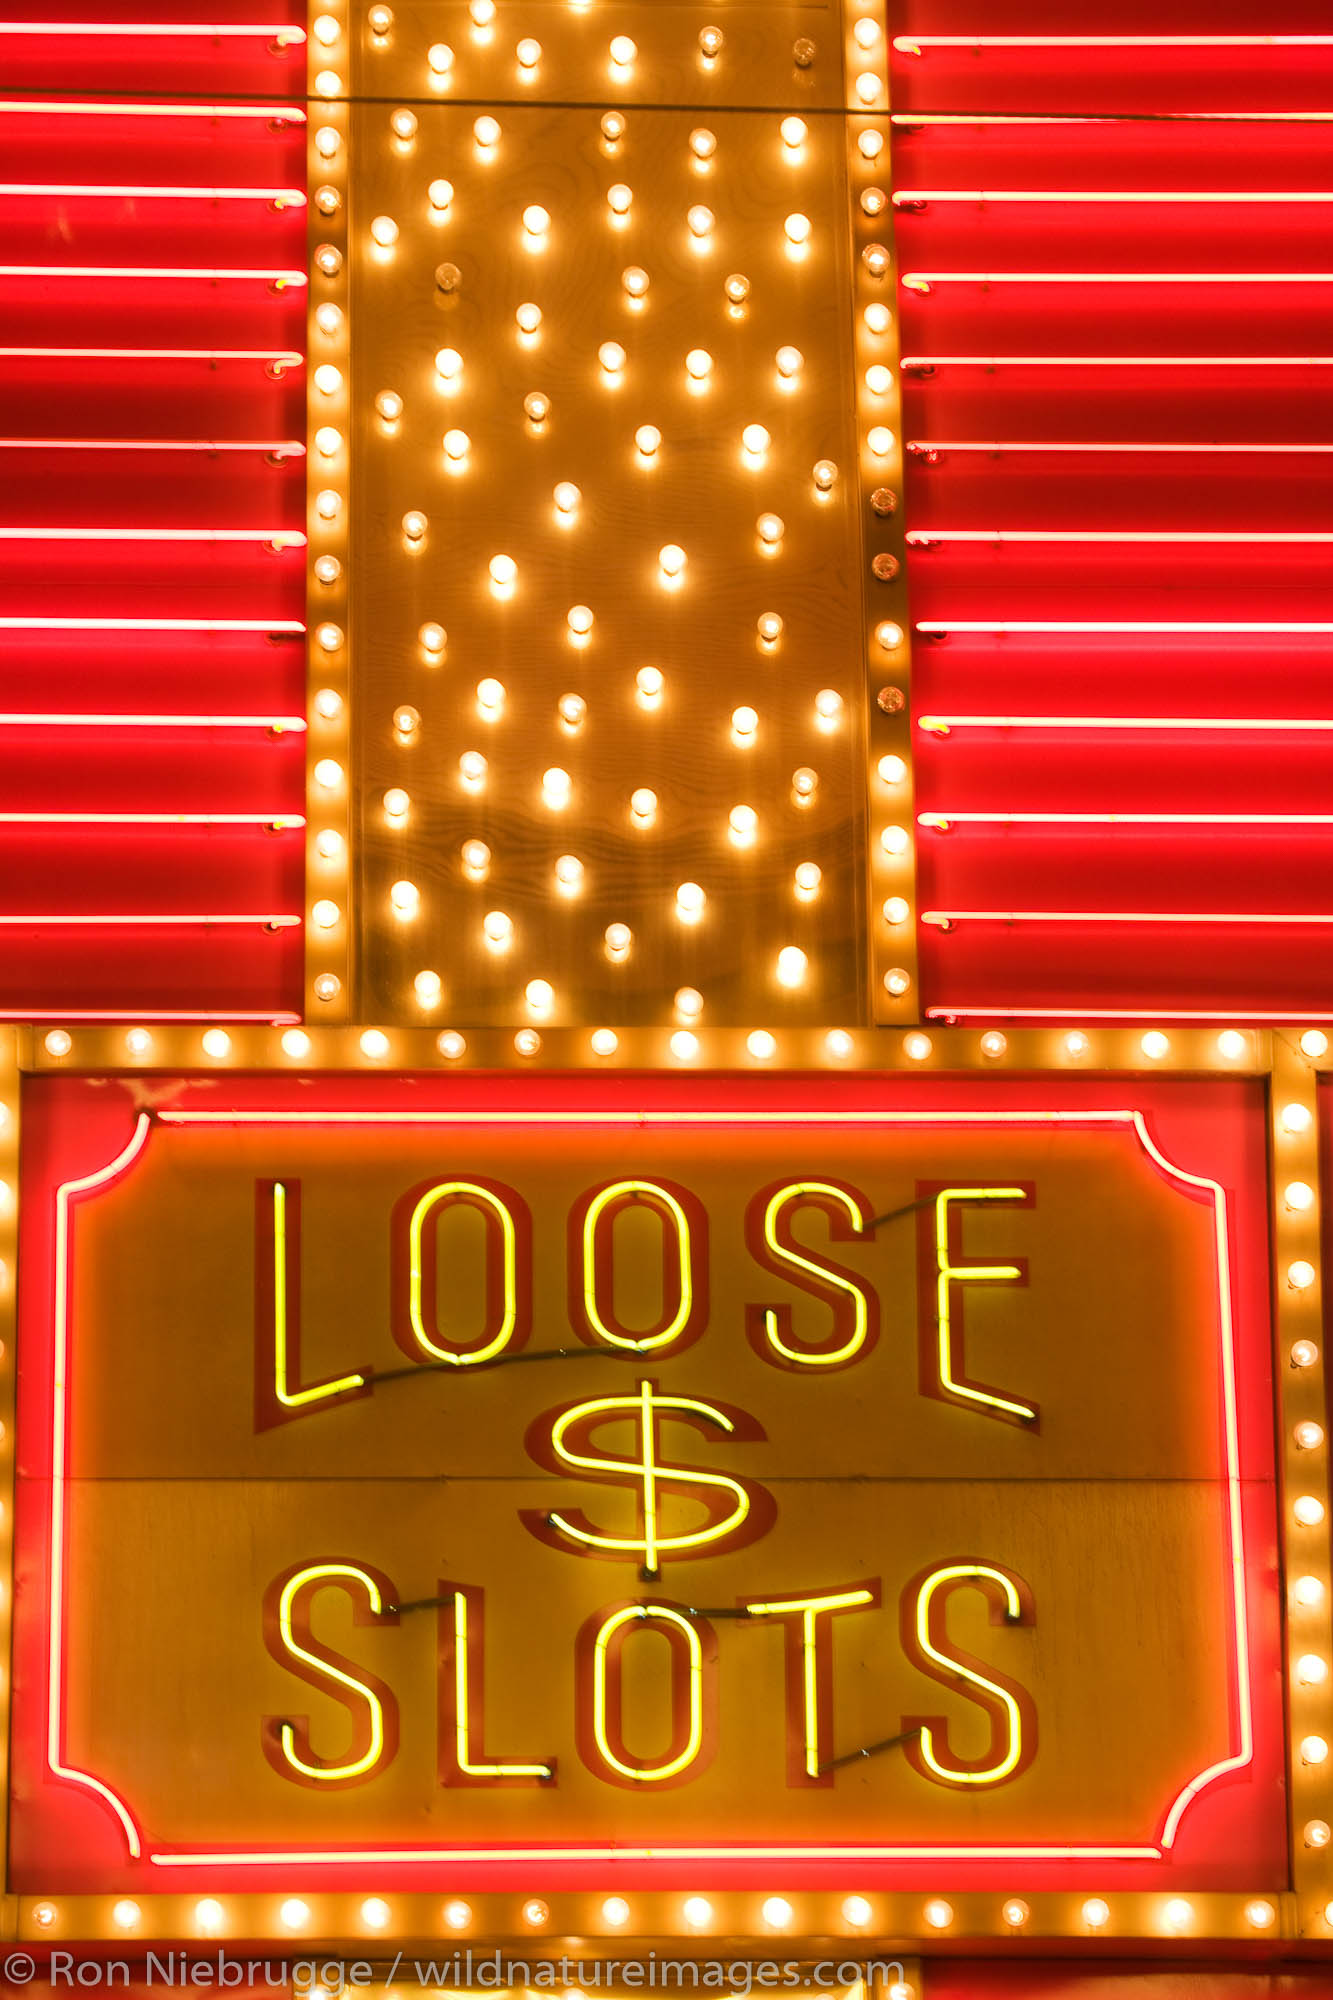 Loose Slots neon sign, downtown Las Vegas, Nevada.